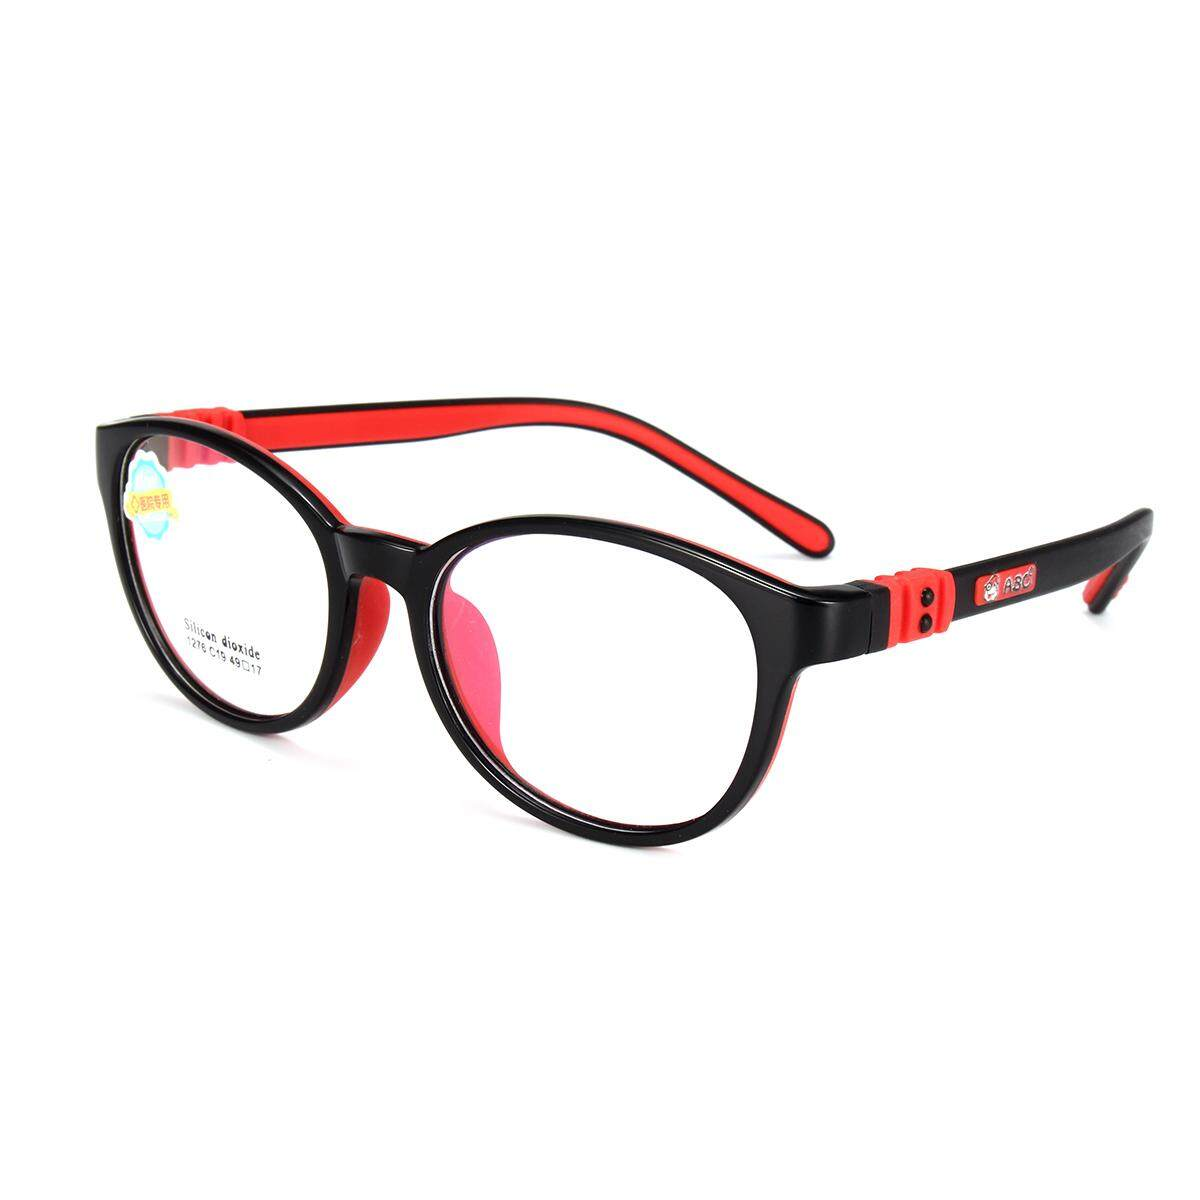 2a52b07ab09 Child s Children Girl Boy Silicone Flexible Eyeglasses Frames Myopia Glasses  RX